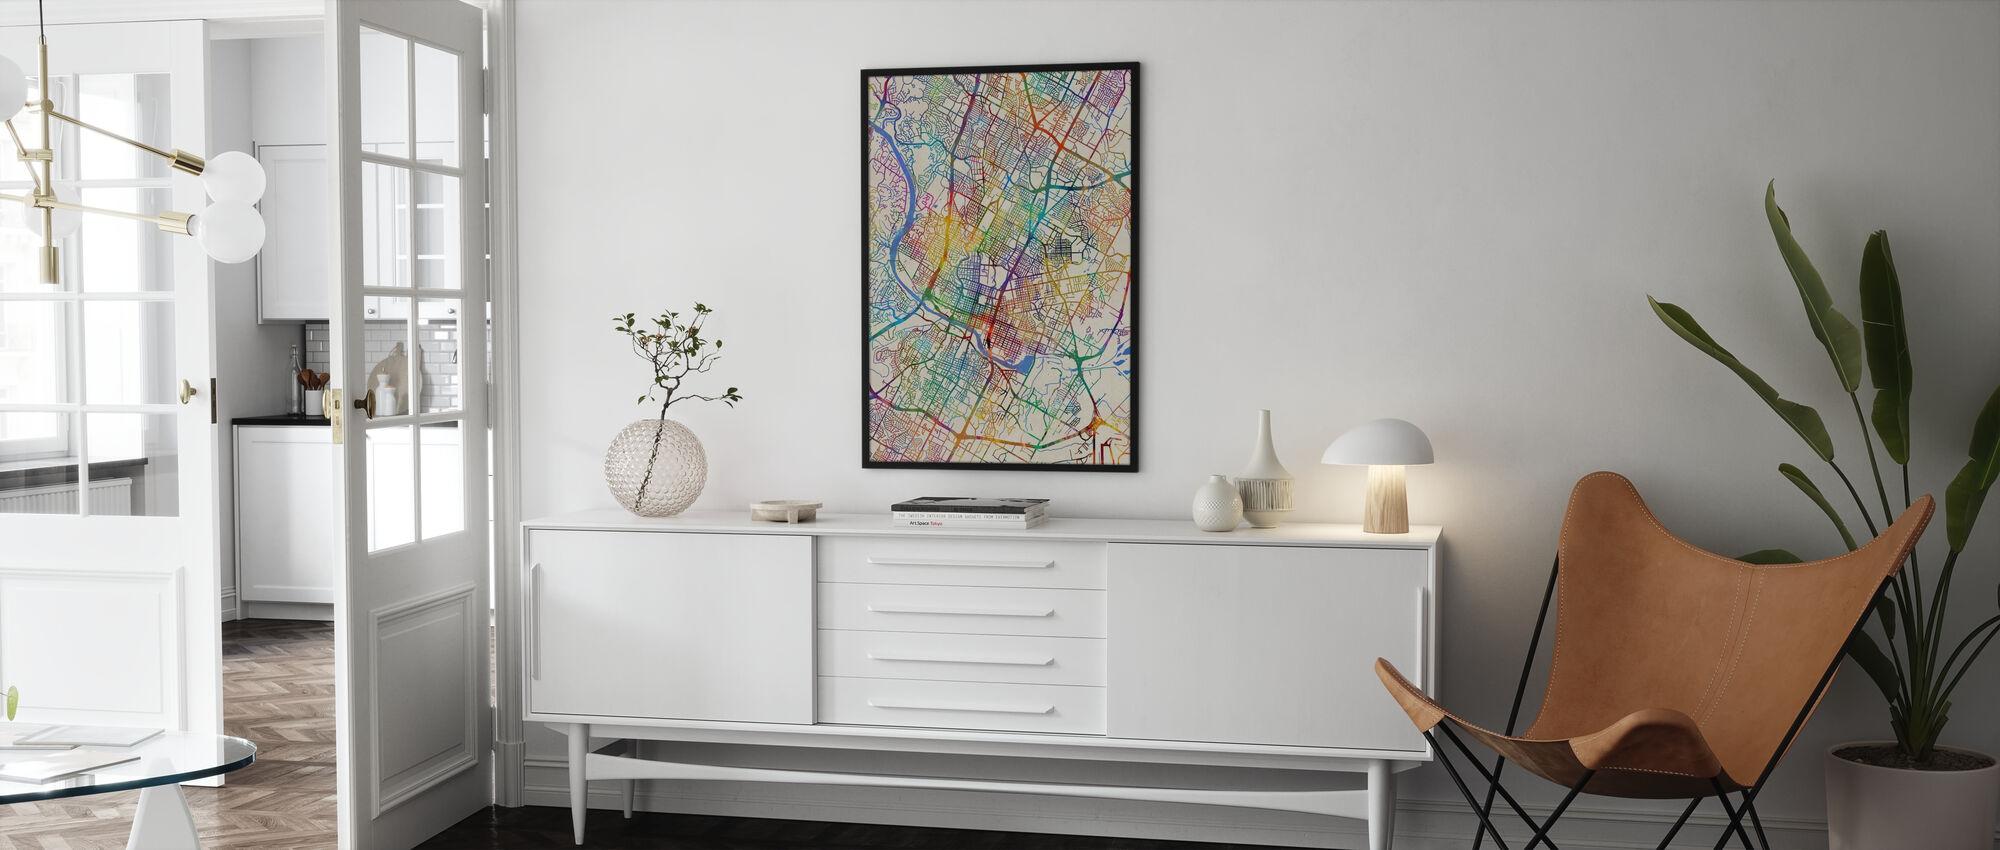 Austin Texas City Map - Poster - Living Room